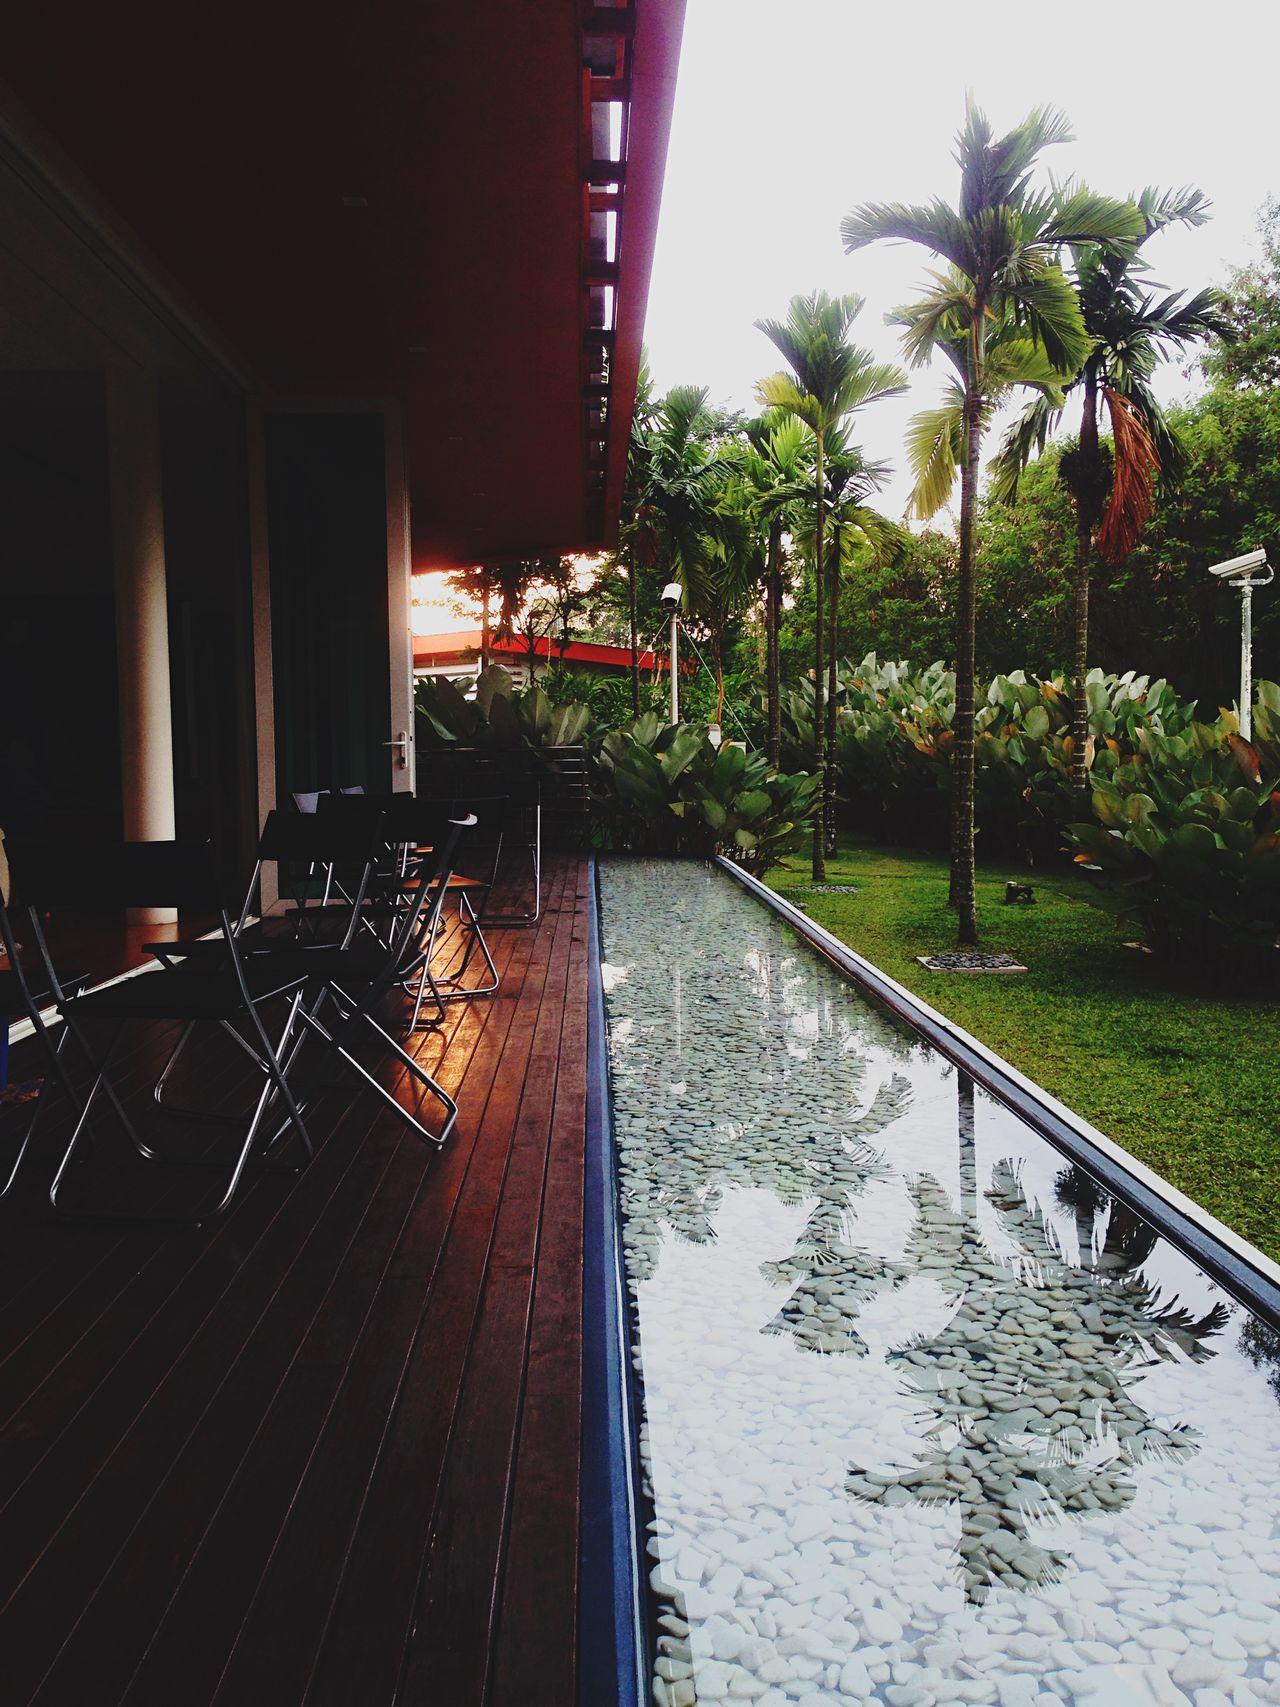 Idea House Denaialam Water Reflections Garden Architecture